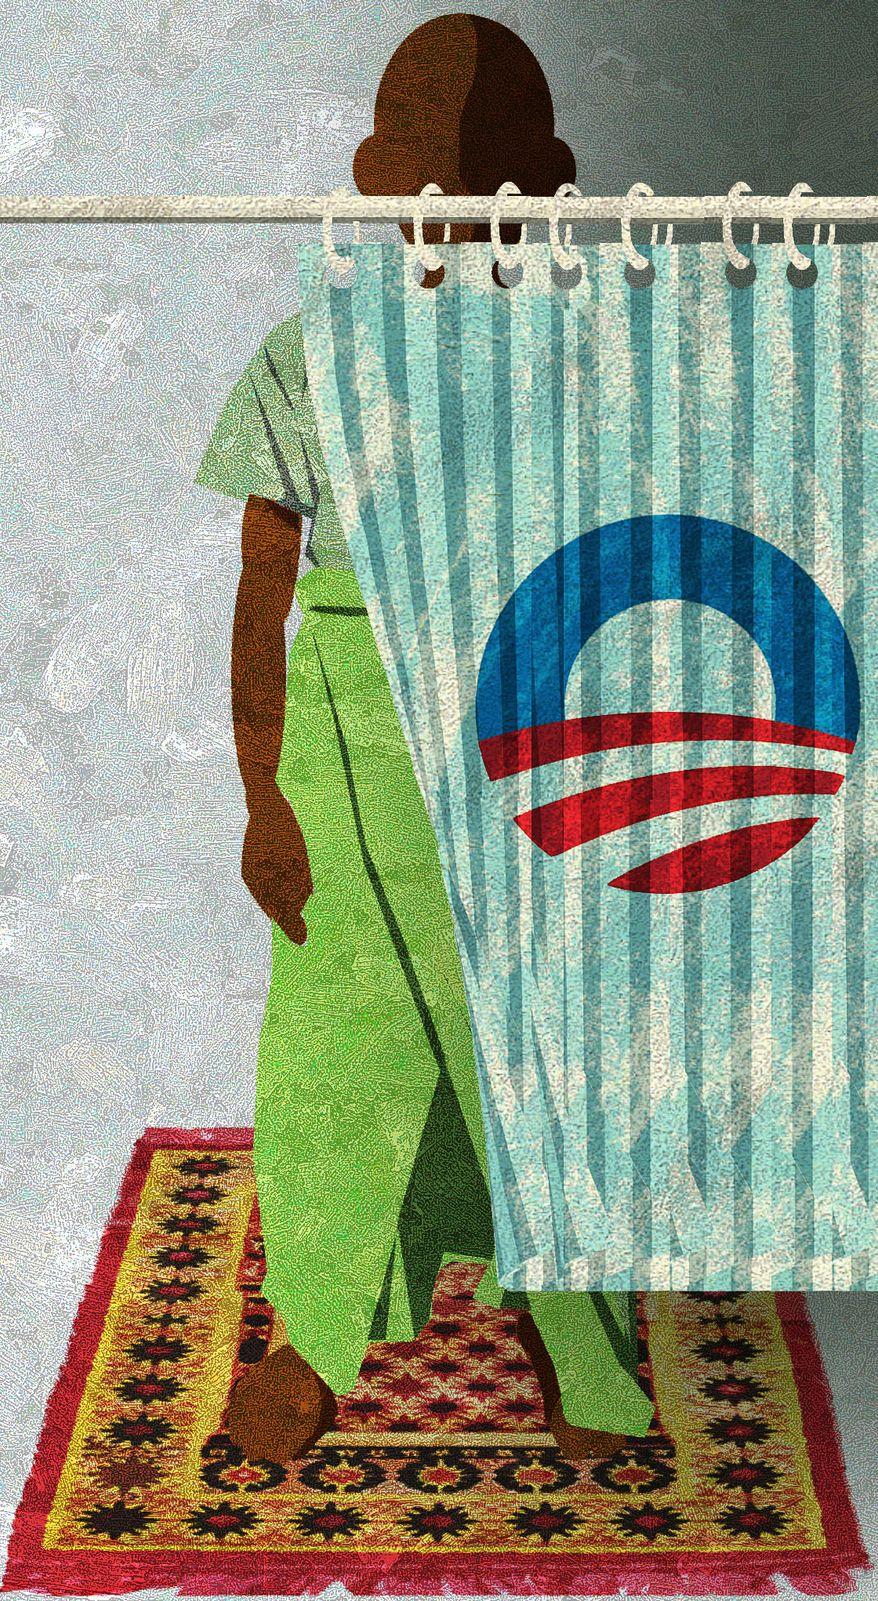 Illustration Muslim Obama by Alexander Hunter for The Washington Times